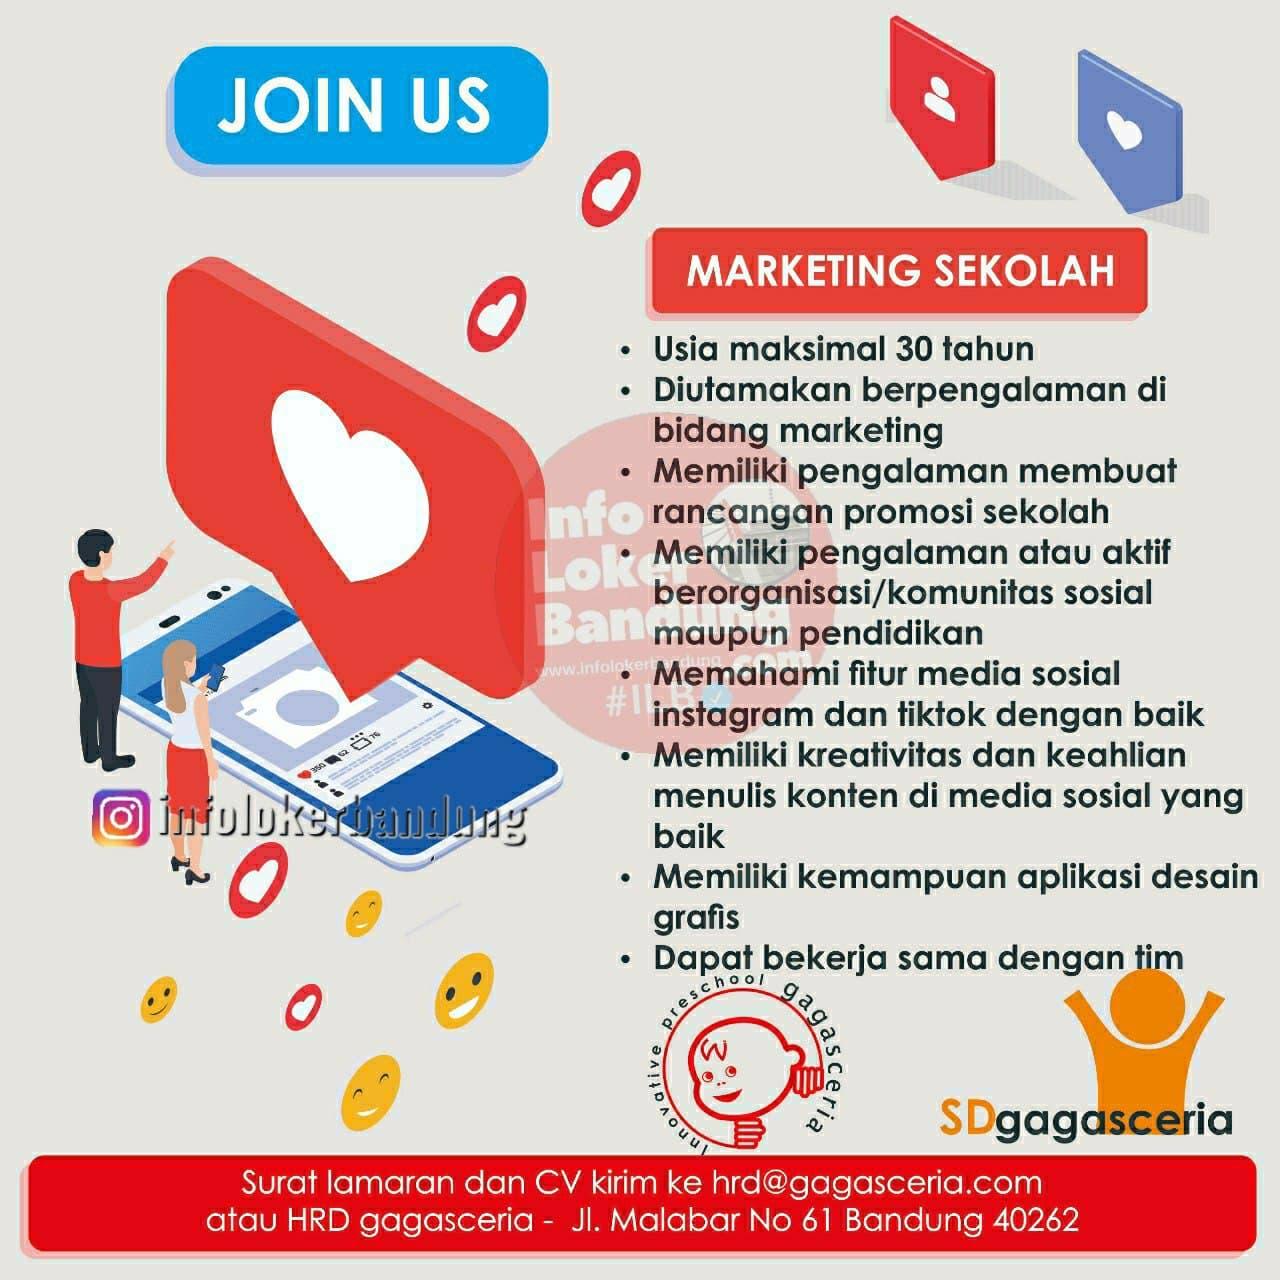 Lowongan Kerja Marketing Sekola SD Gagas Ceria Bandung Oktober 2021